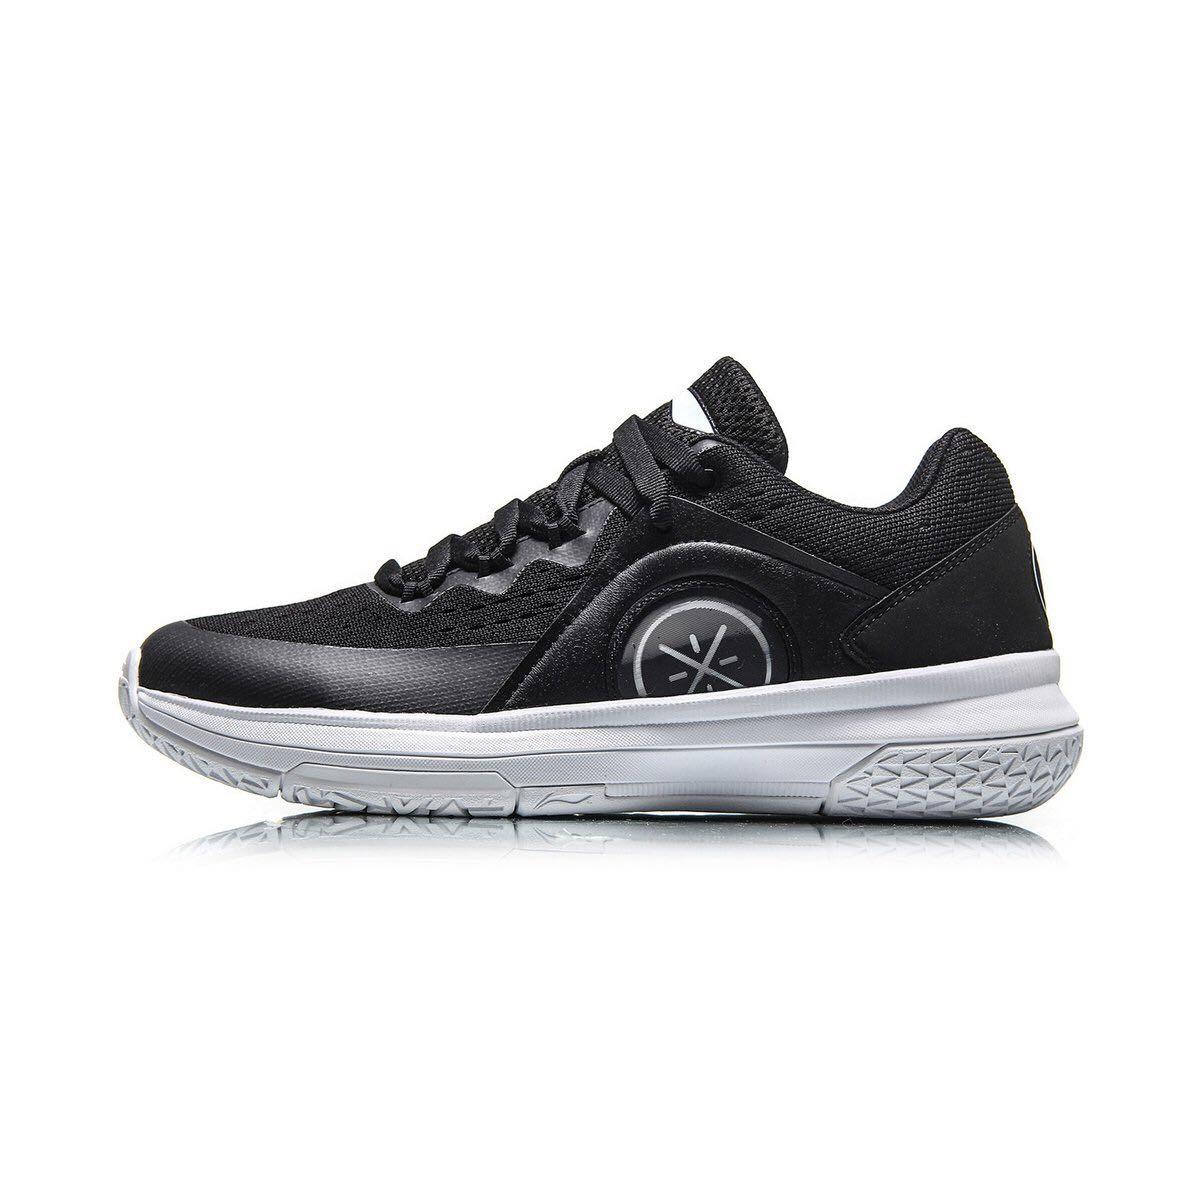 LI-NING 李宁 ABAN033 男款篮球运动鞋